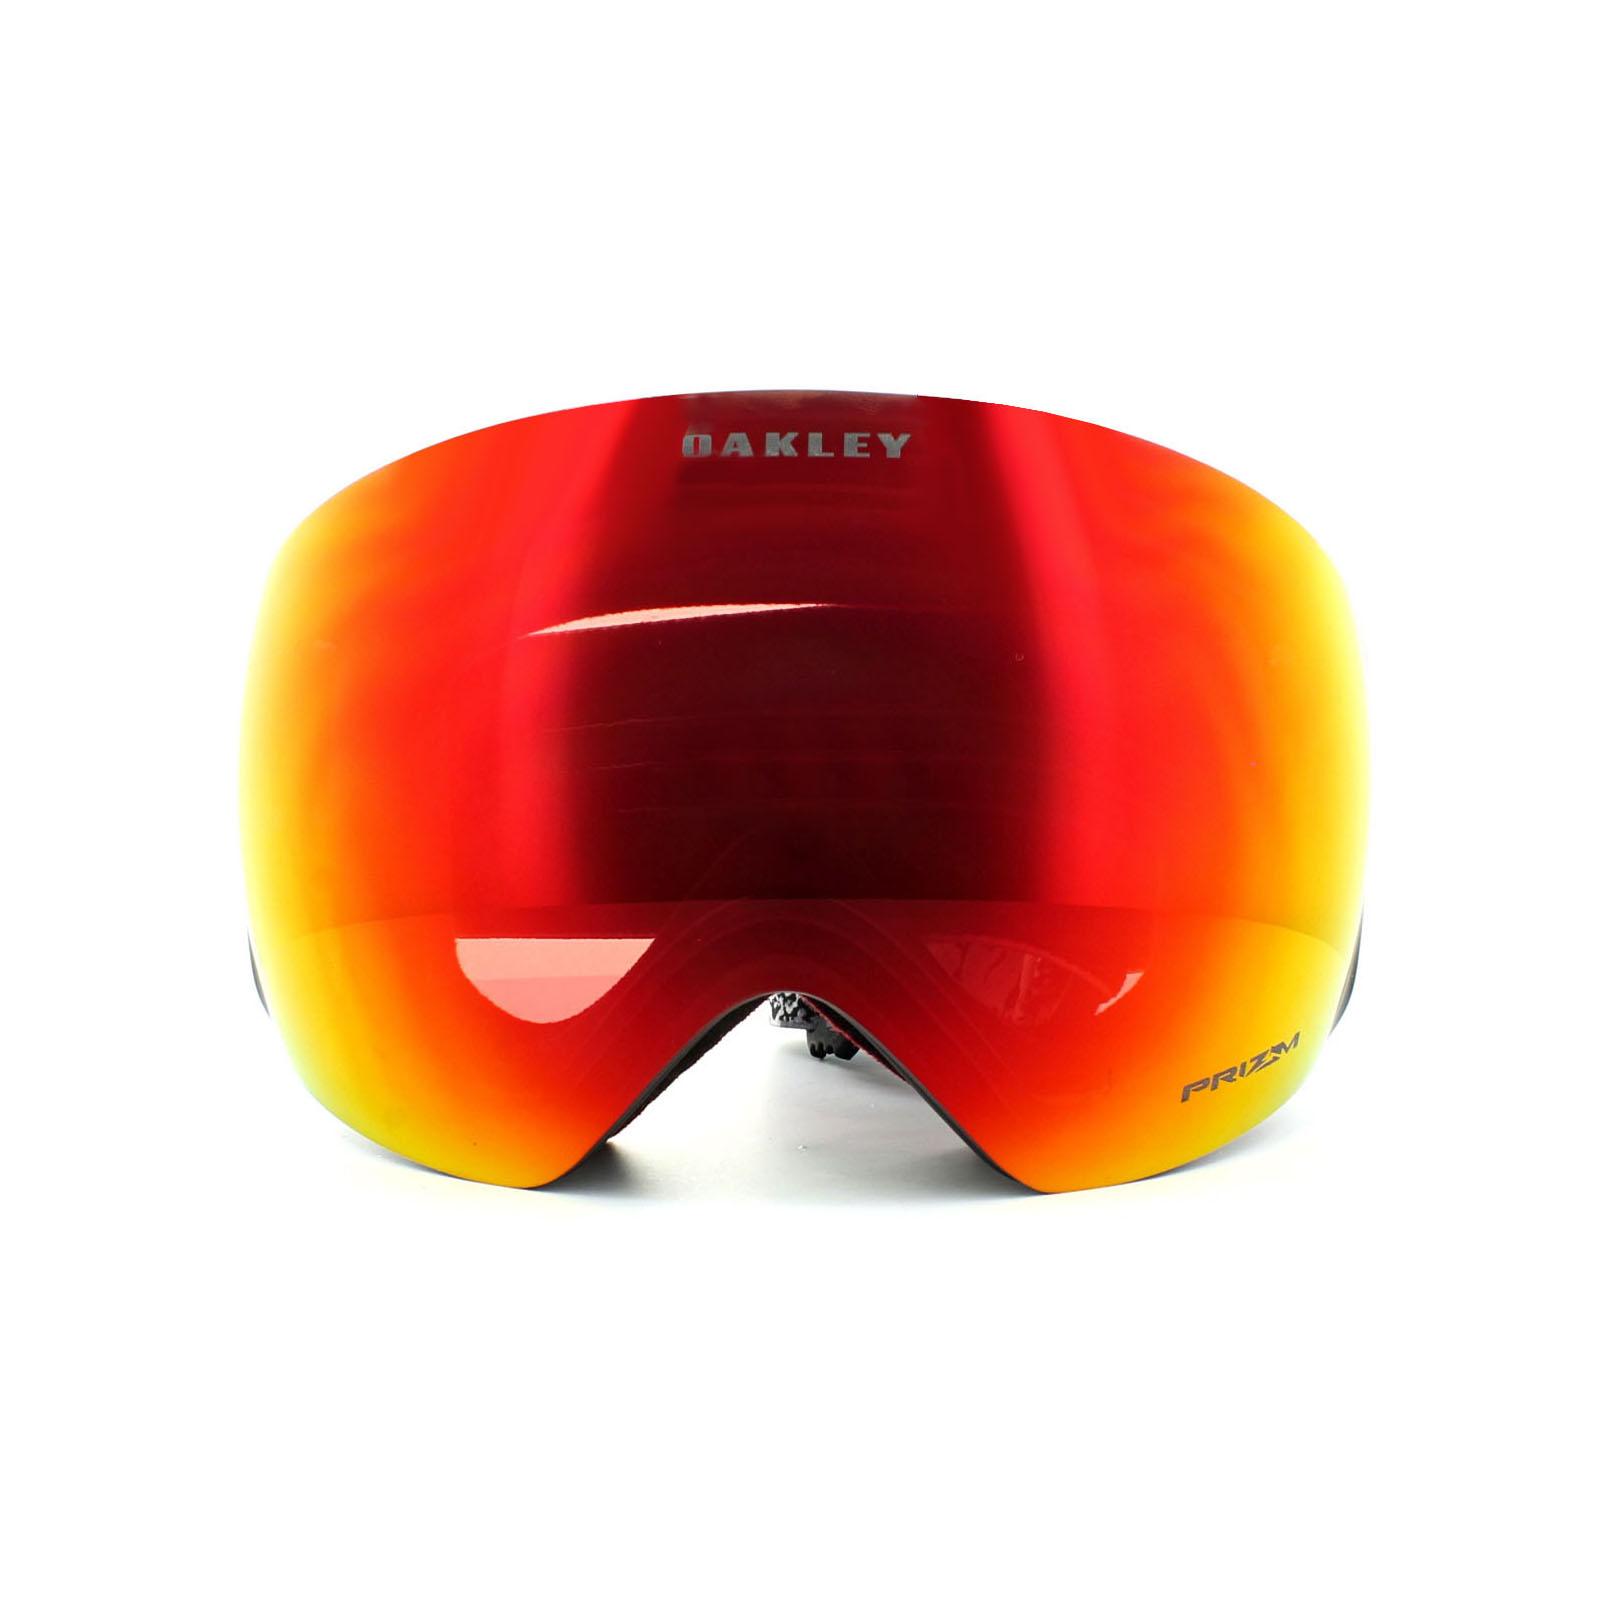 oakley ski goggles flight deck rnee  Oakley Ski Goggles Flight Deck OO7050-46 SM Valley Of Death Prizm Torch  Iridium